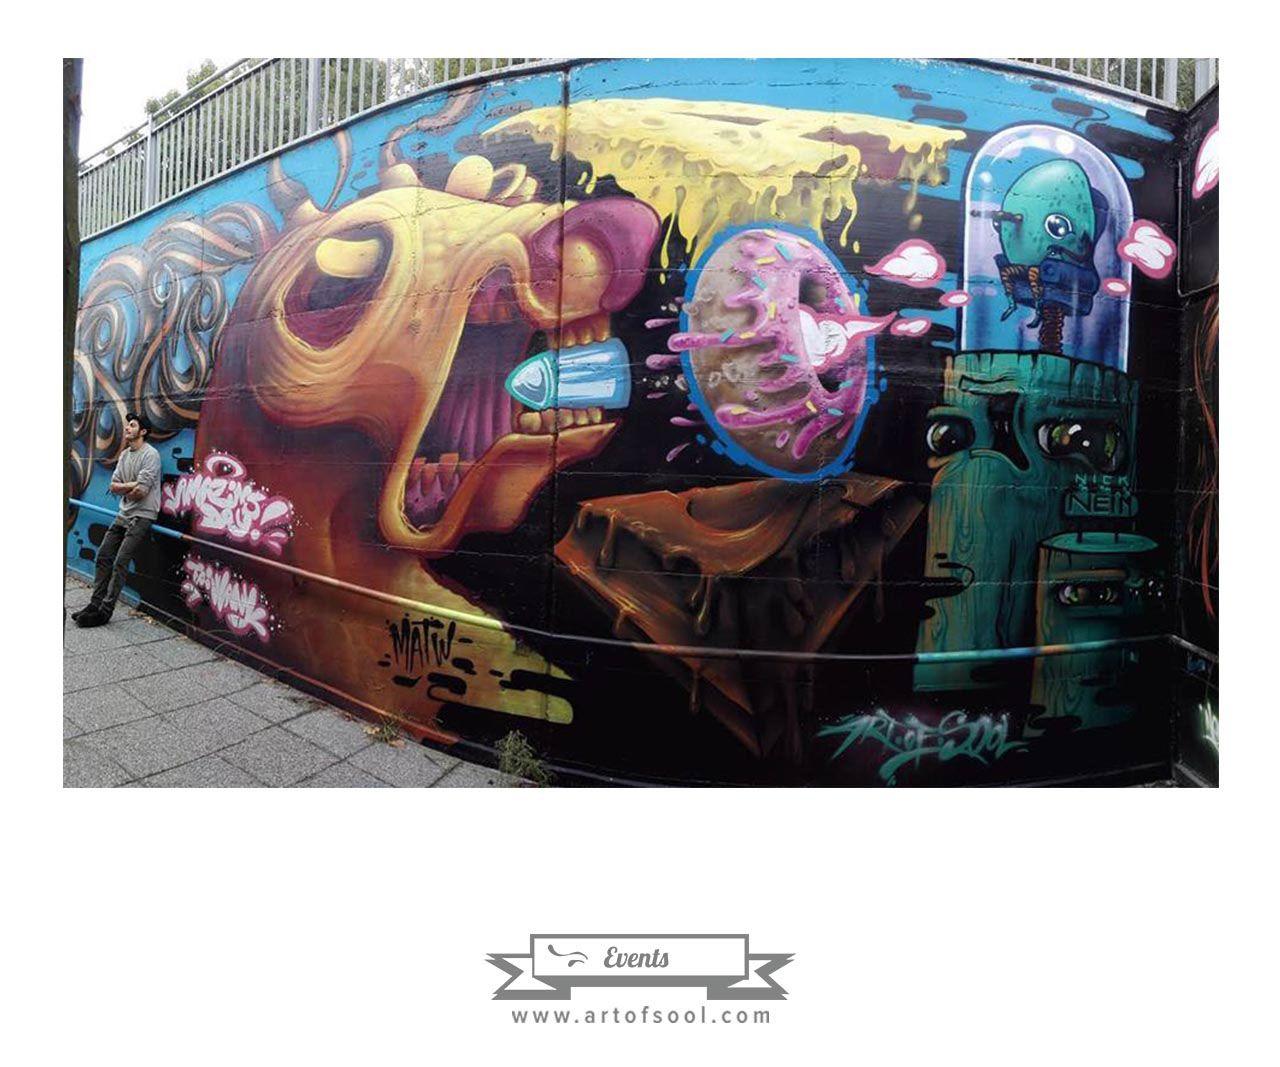 Wall @Amazing Day '16 - Milano on Behance